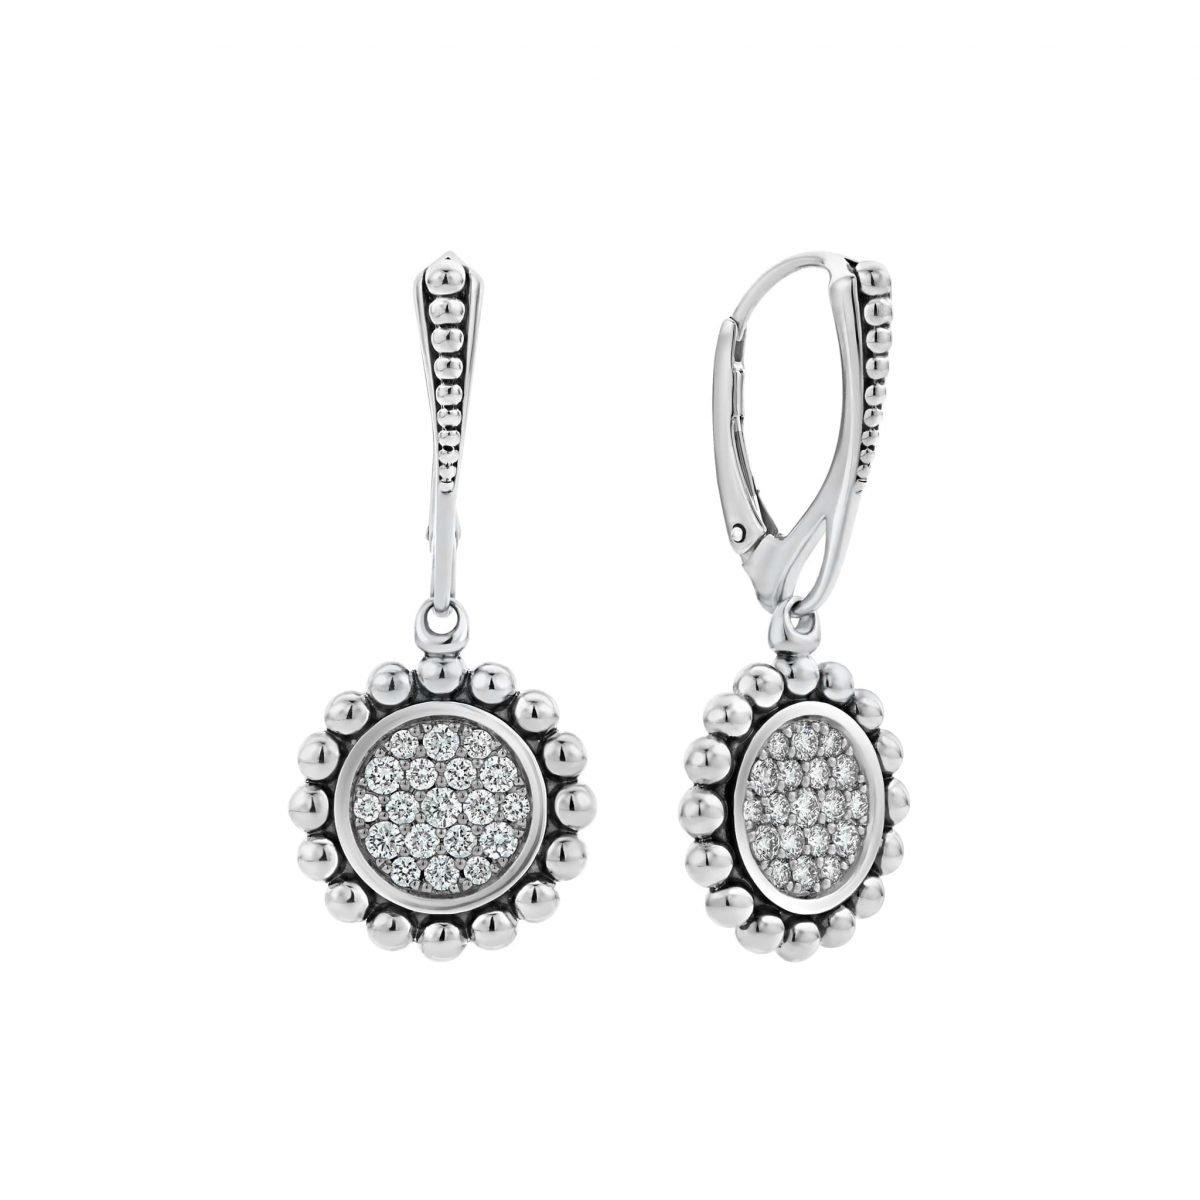 Caviar Spark Diamond Drop Earrings